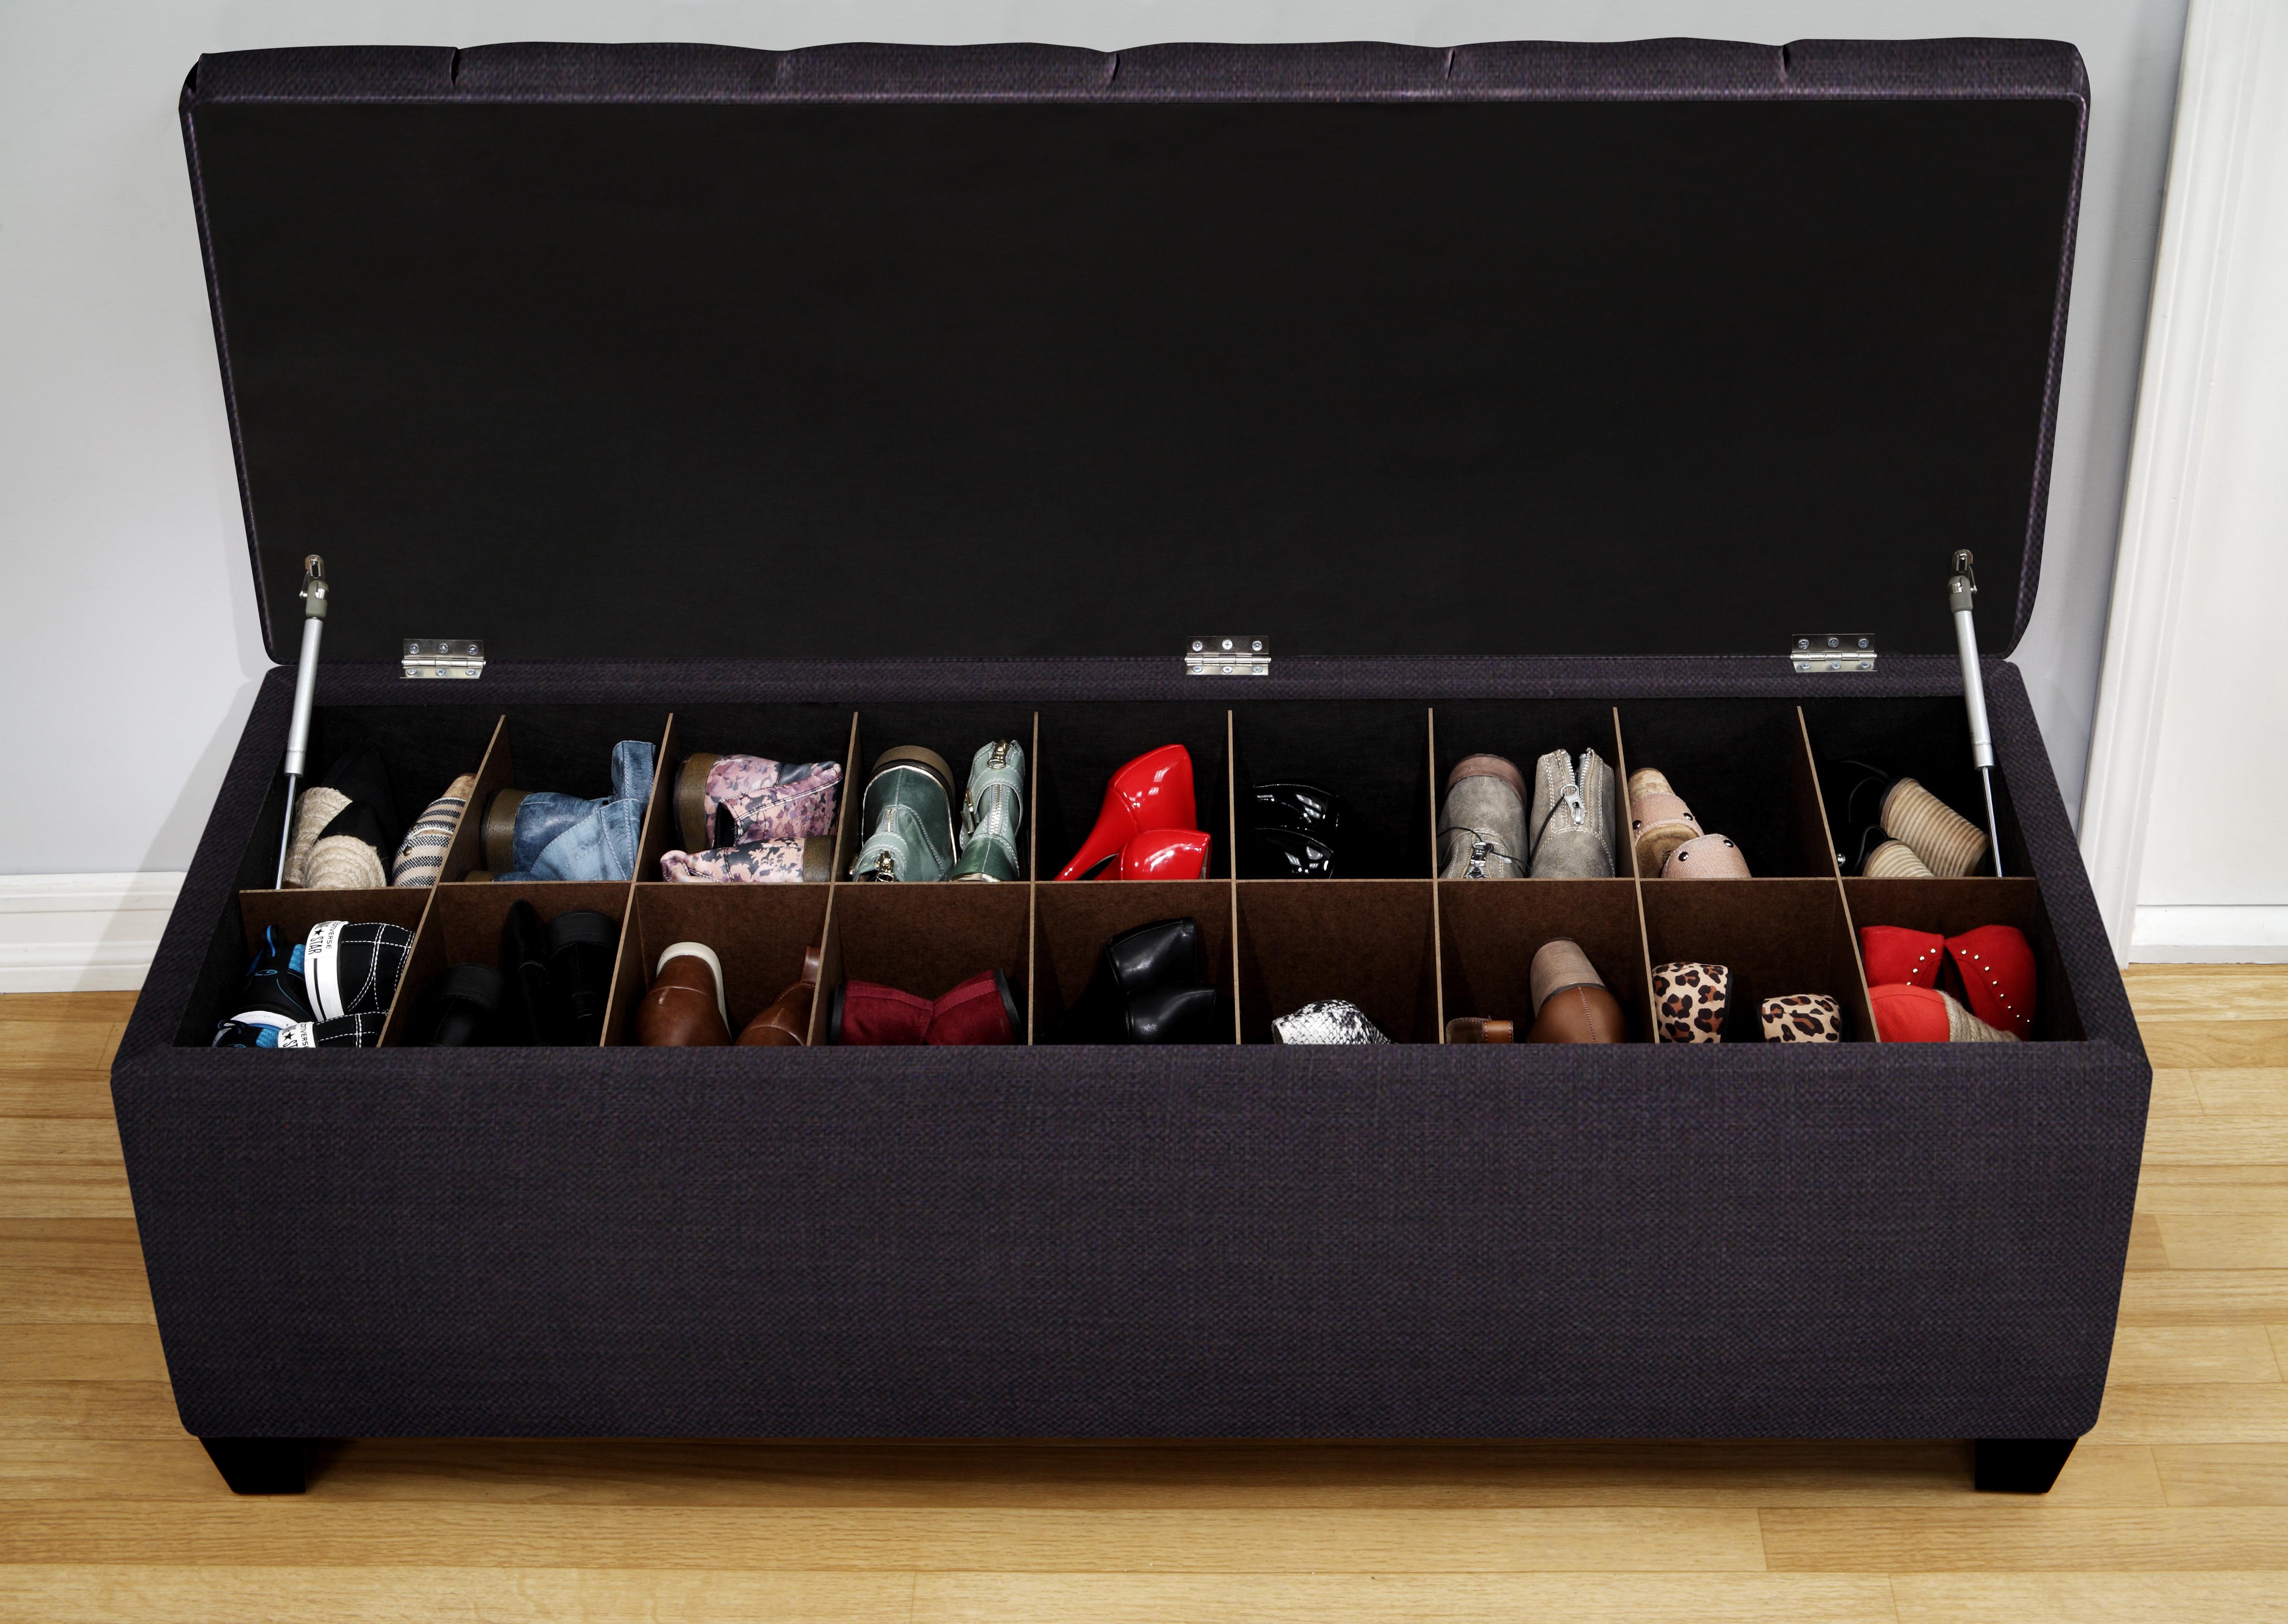 Shoe Storage Bench Slots Full Shoes Entryway Hidden Panels Homifind,Bright Orange Kitchen Accessories